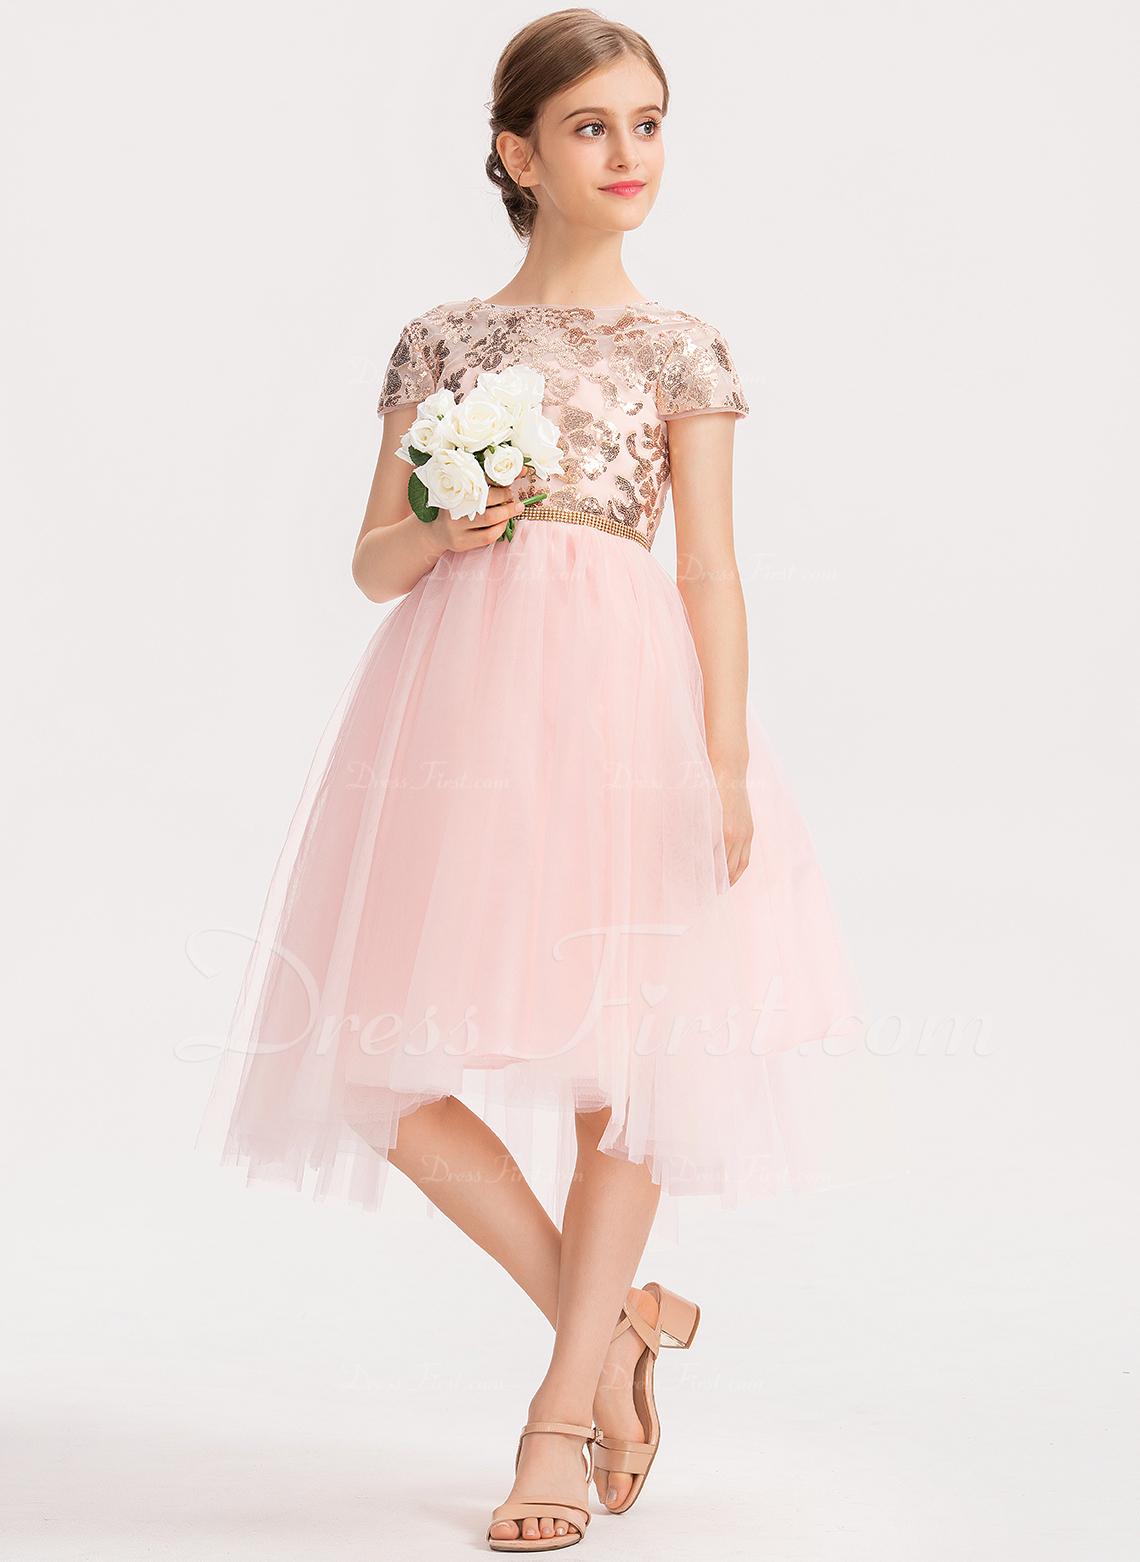 Aライン スクープネック 非対称 チュール ジュニアブライドメイドドレス とともに スパンコール